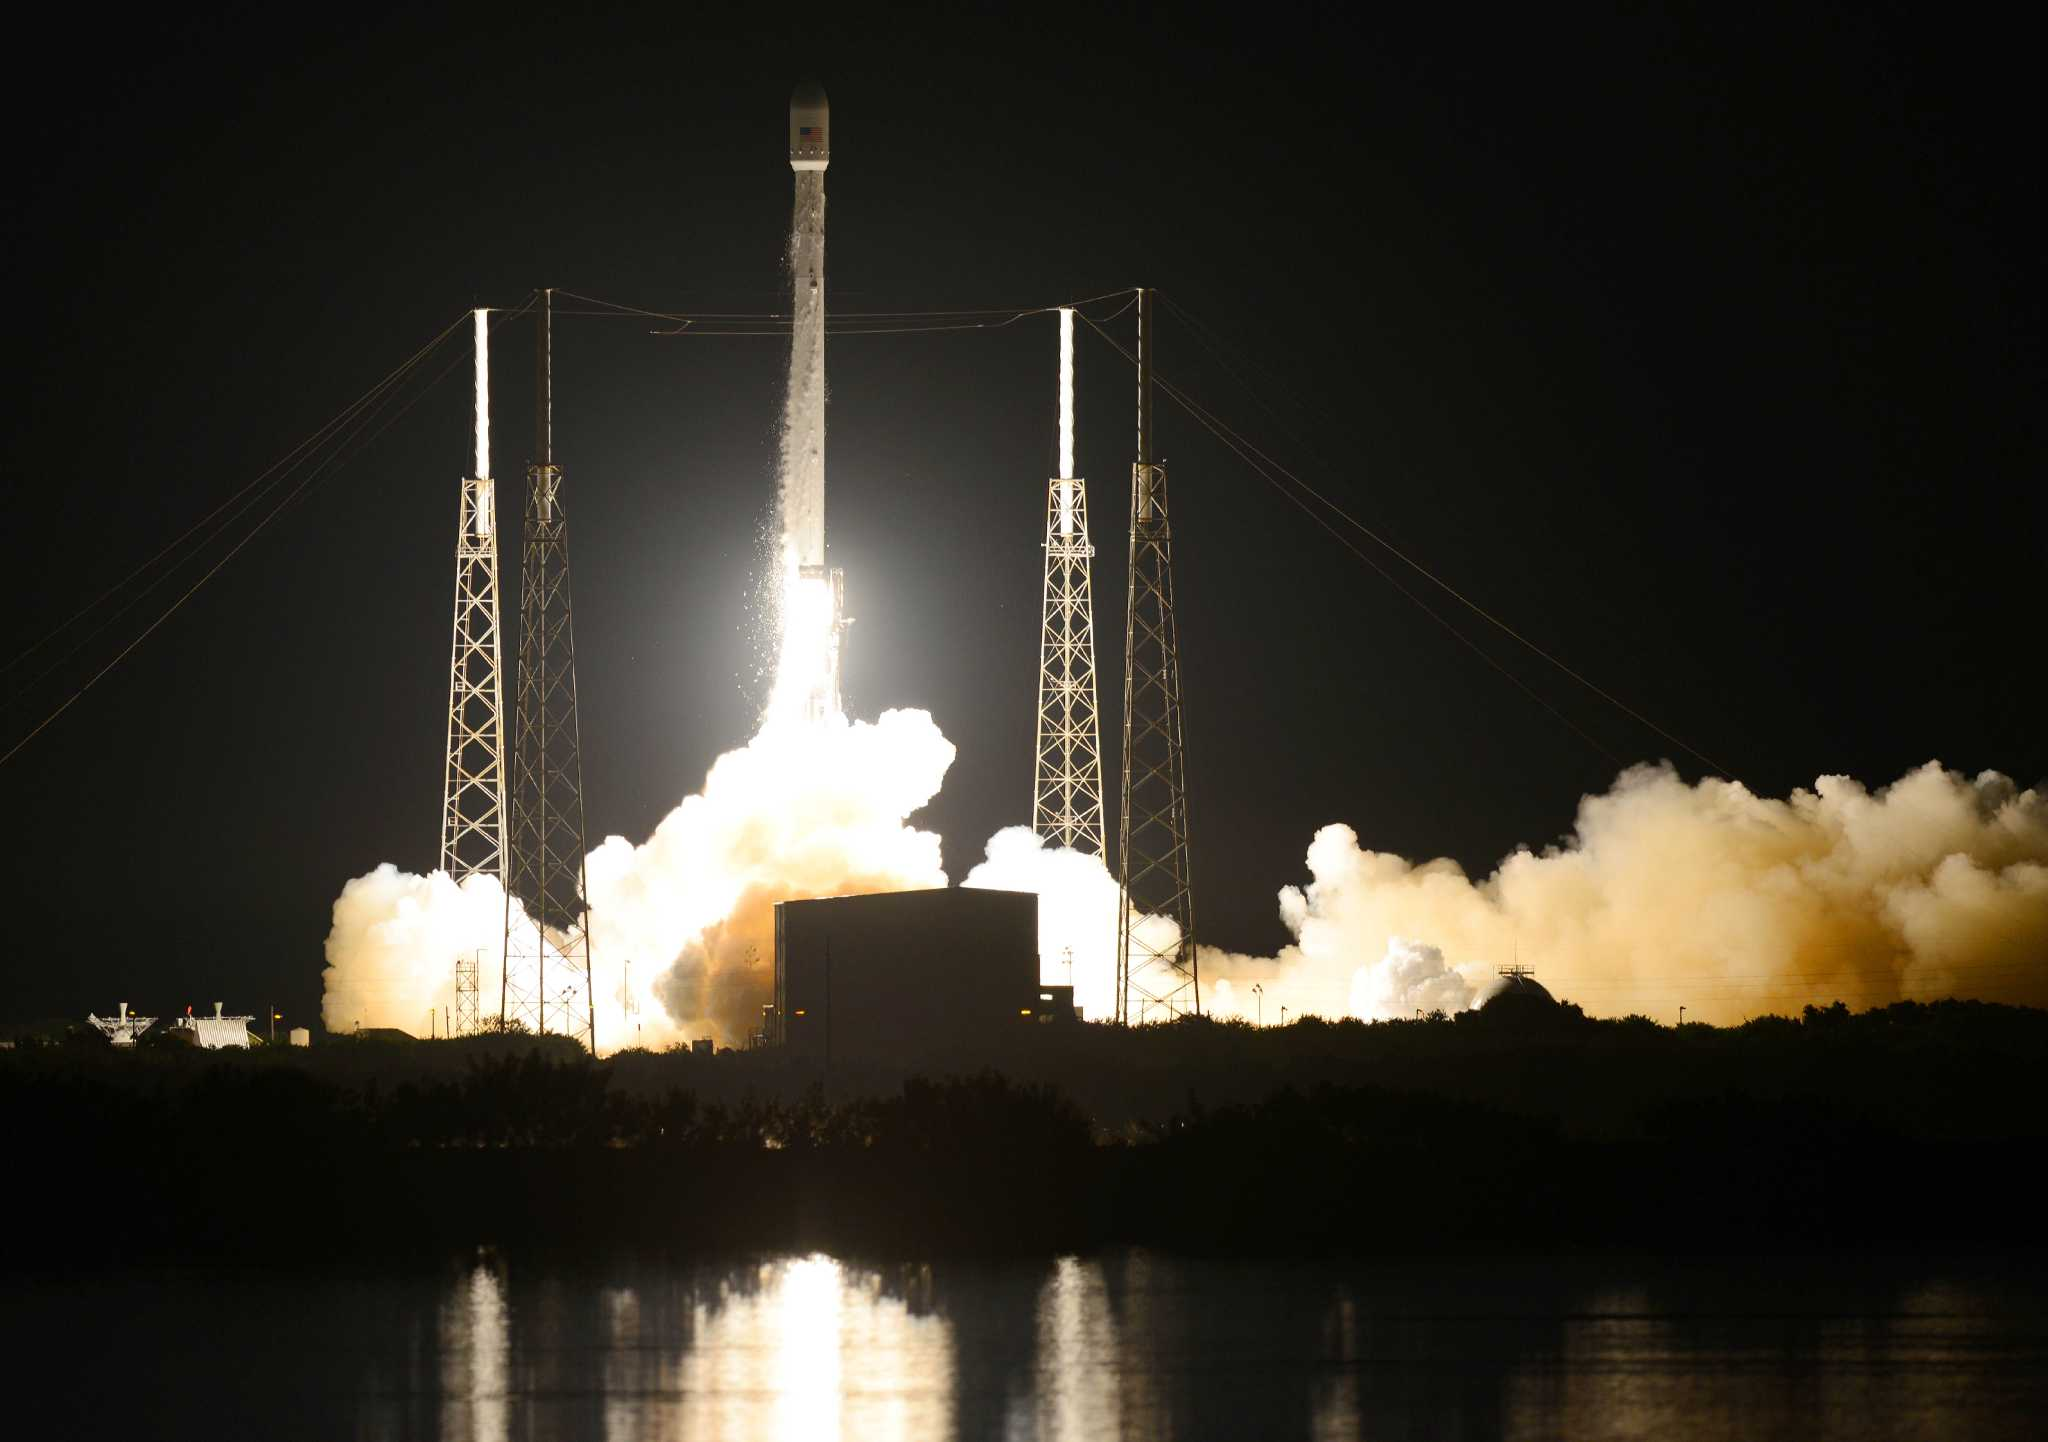 spacex dragon launch texas - photo #13